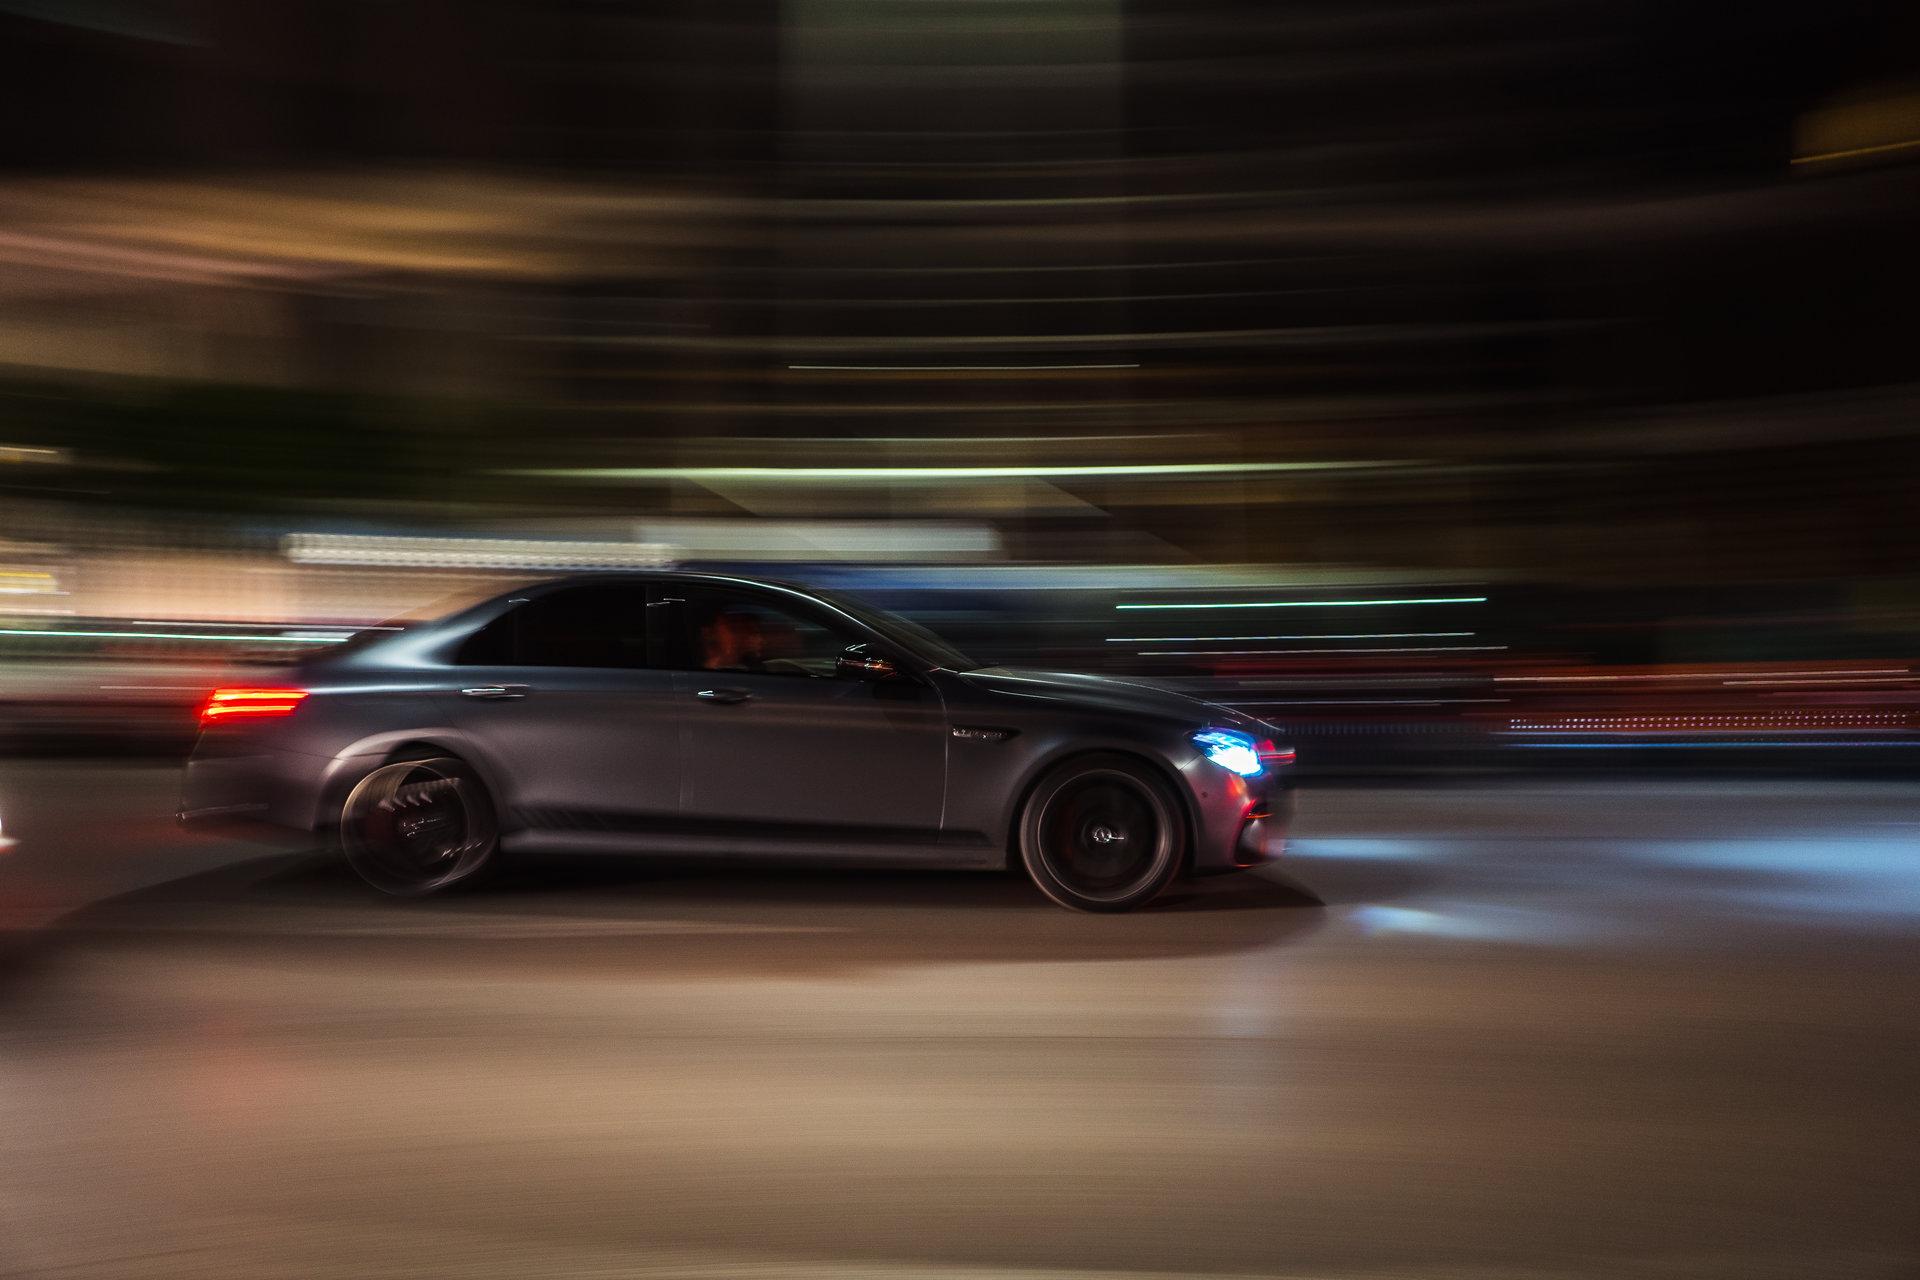 Stop speeding, save a life | Author Bozhidar_Iliev | PHOTO FORUM